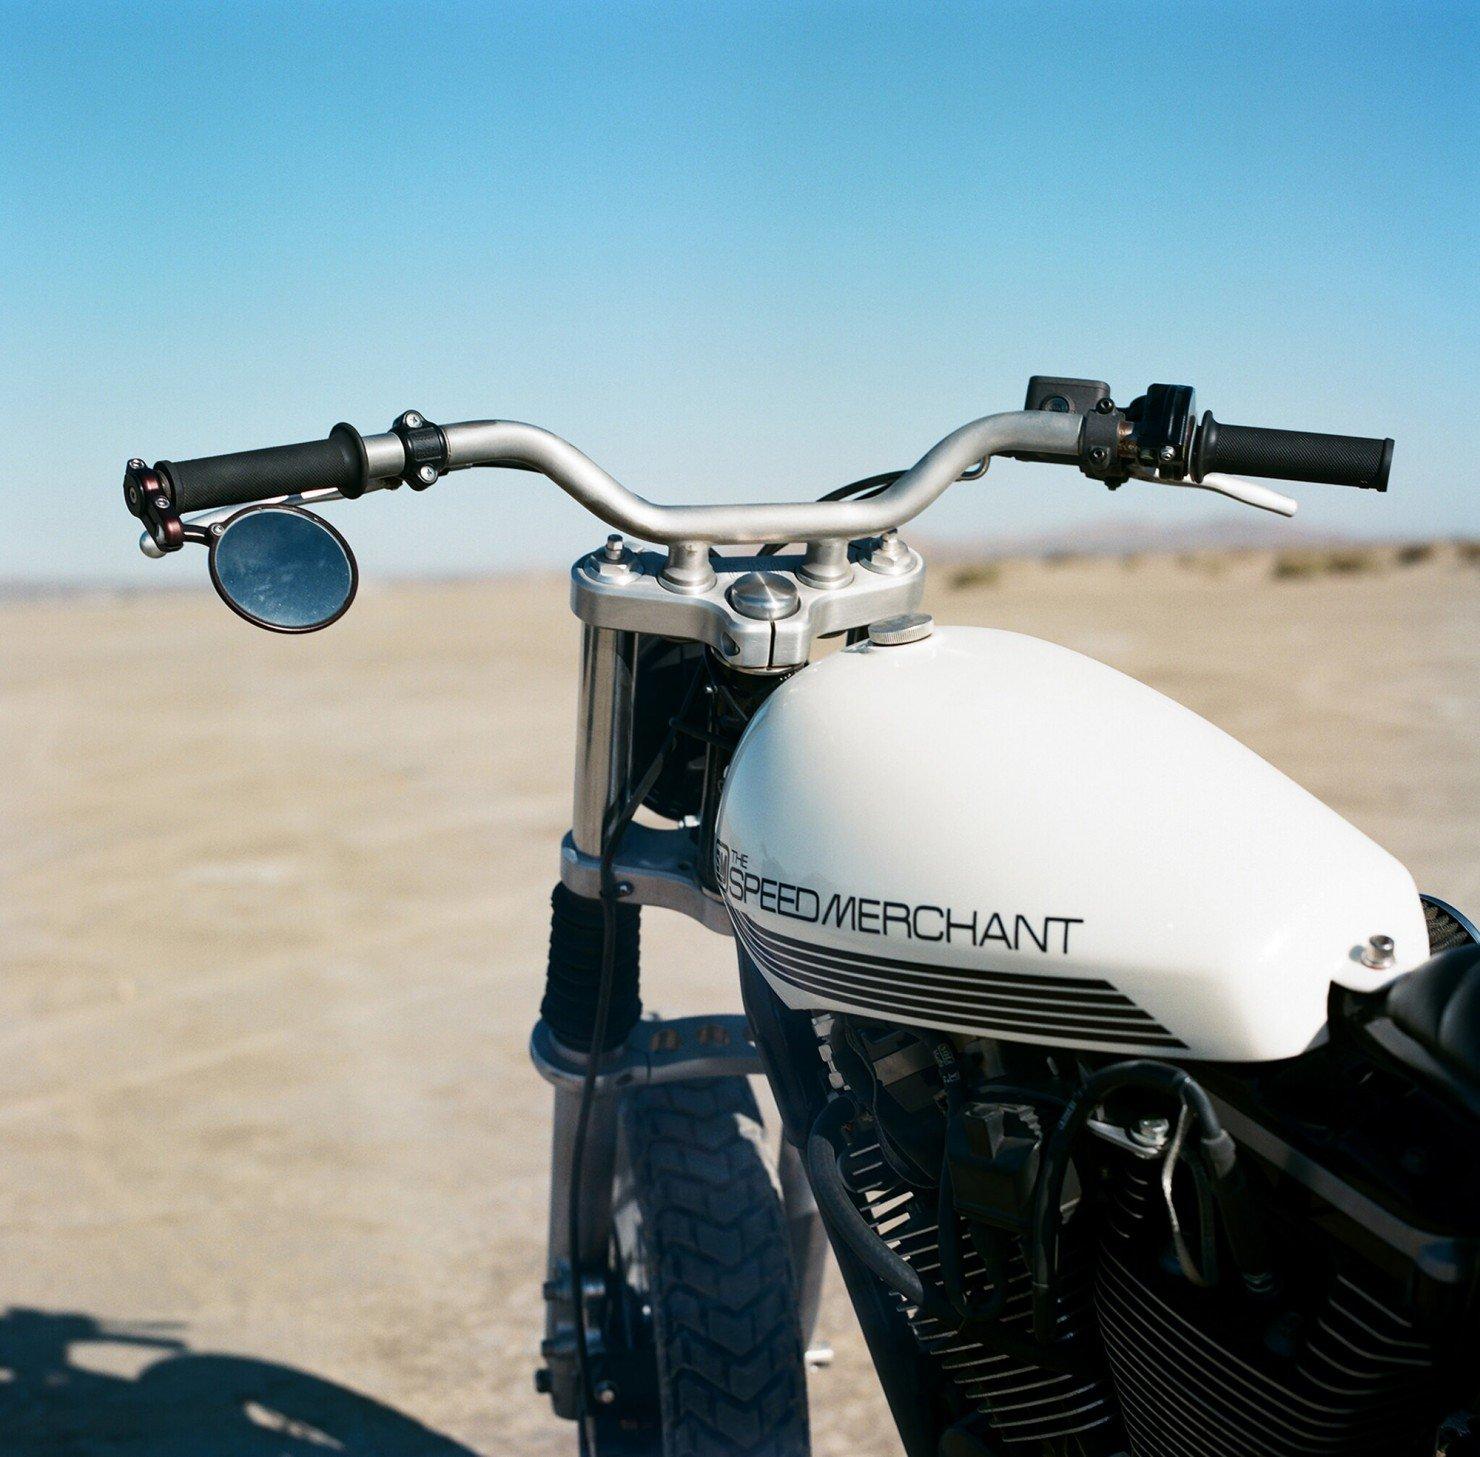 speed_merchant_motorcycles11